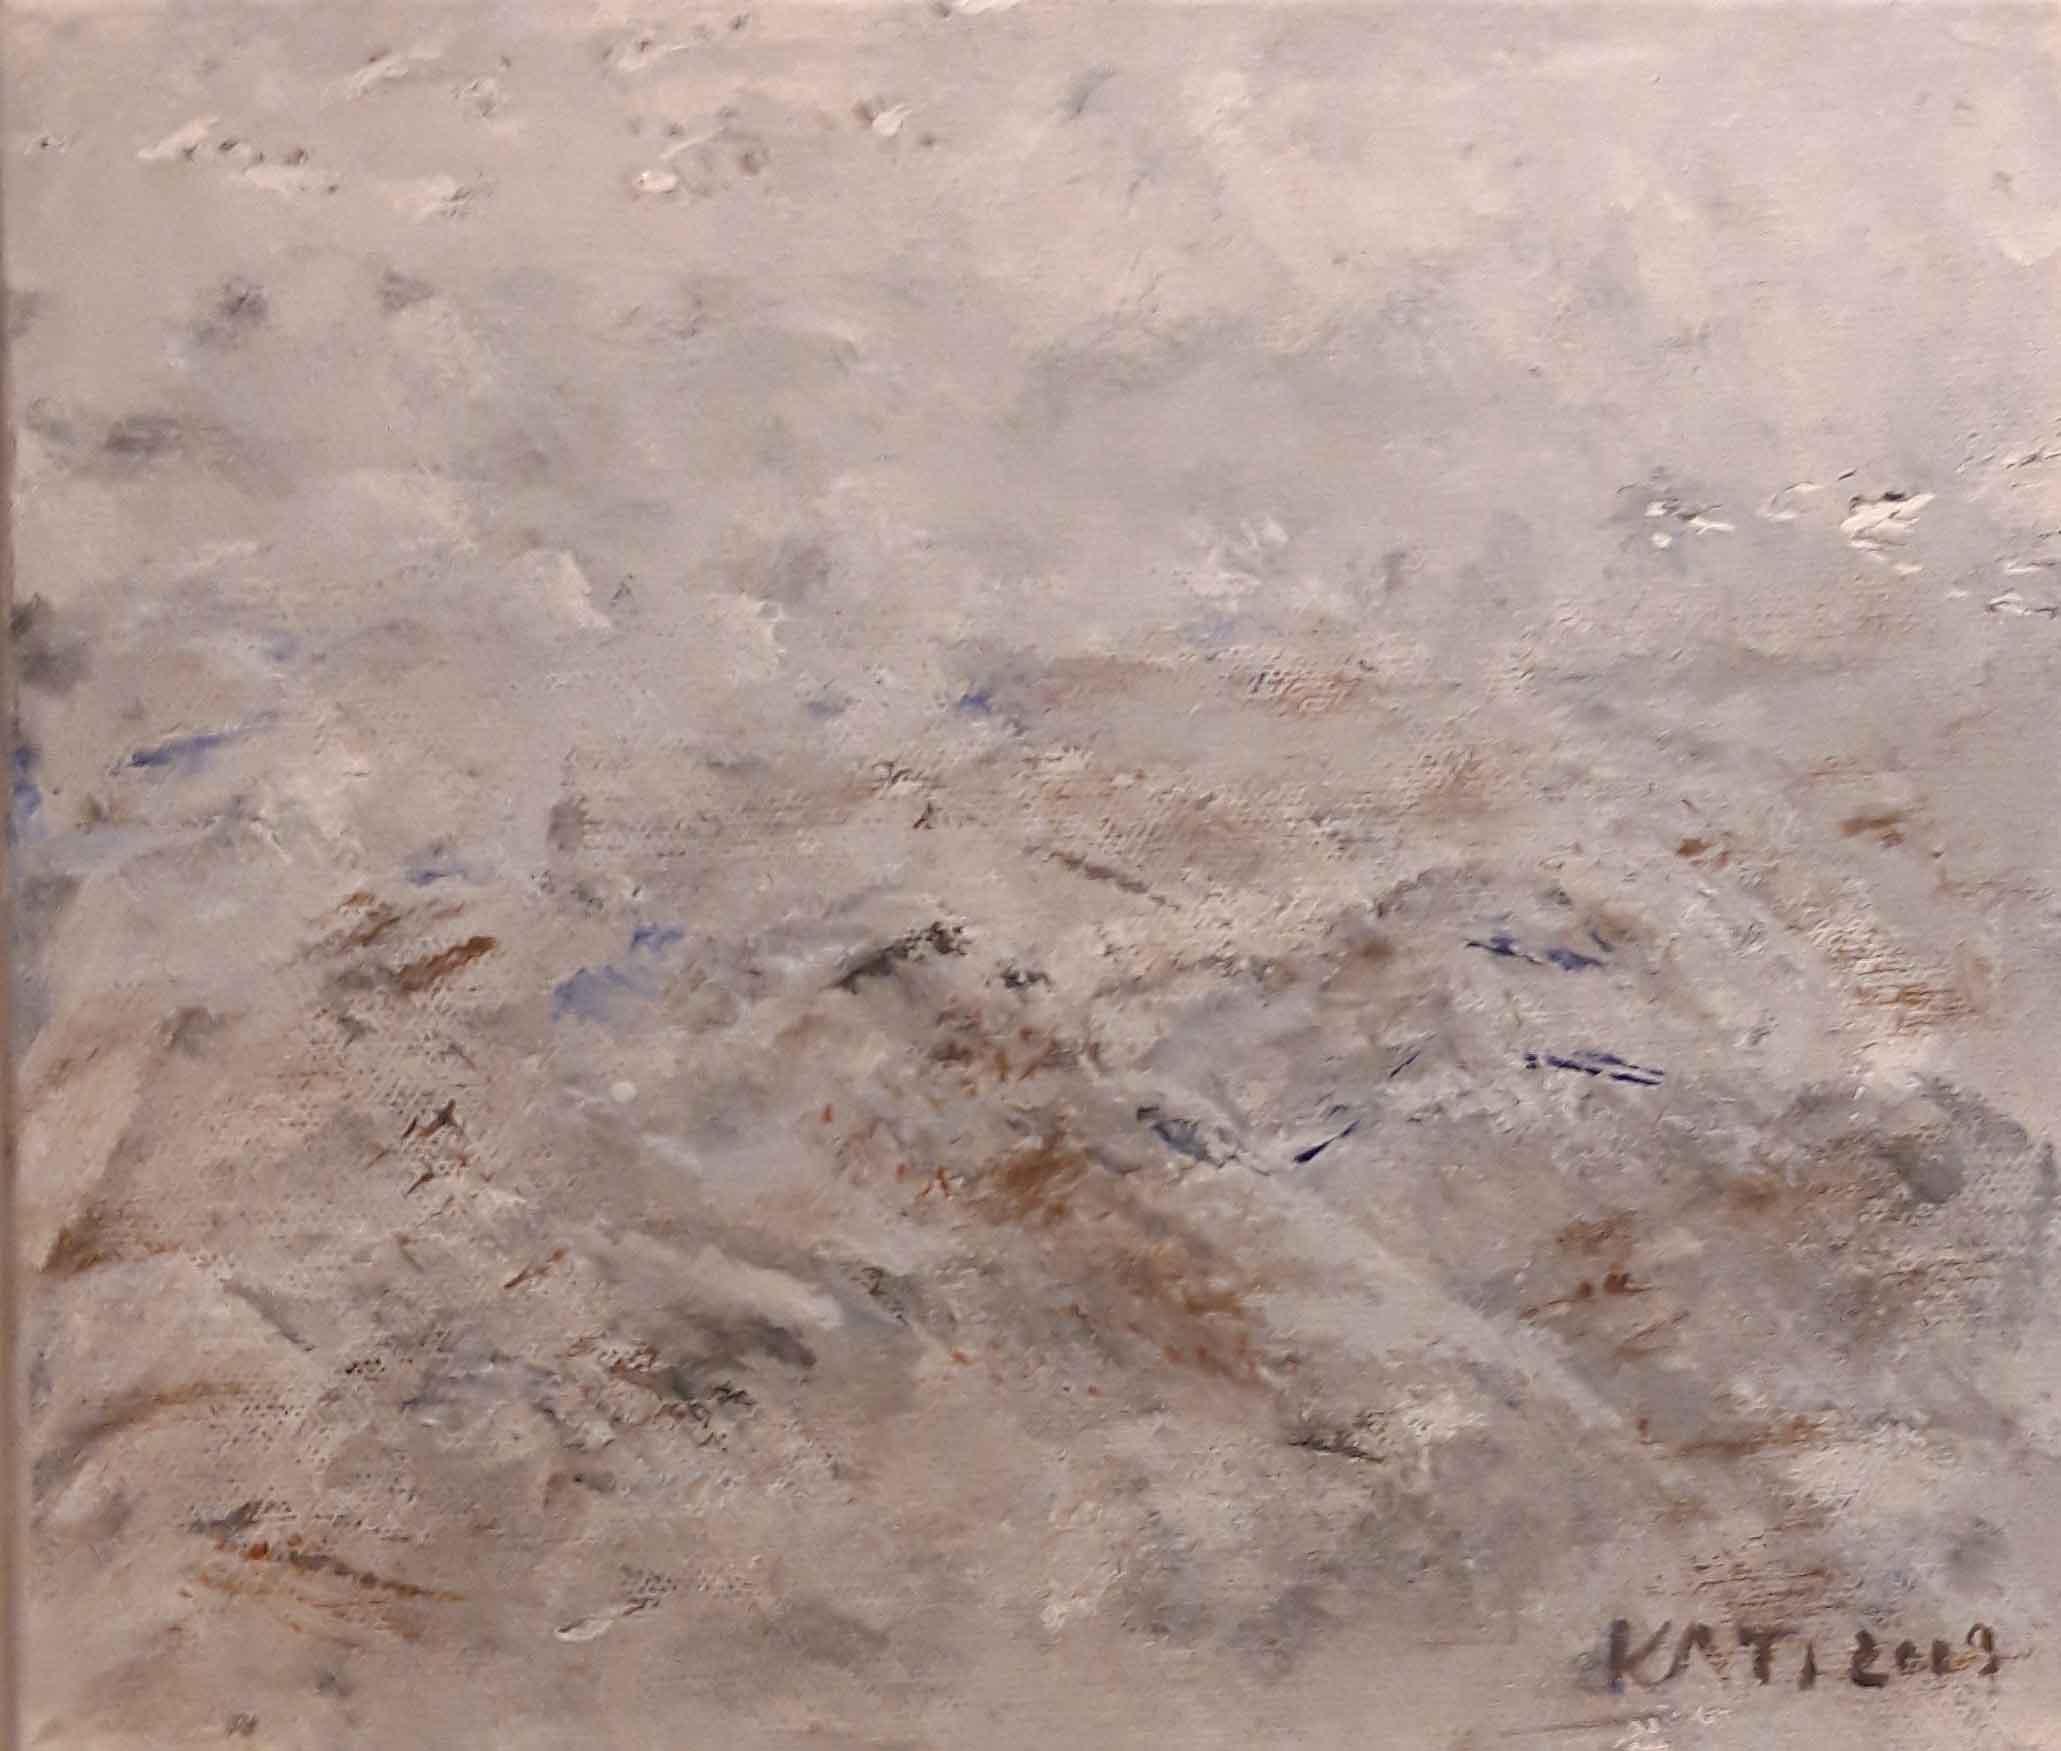 Matkalla 1 2019 Akryyli 25x30 cm